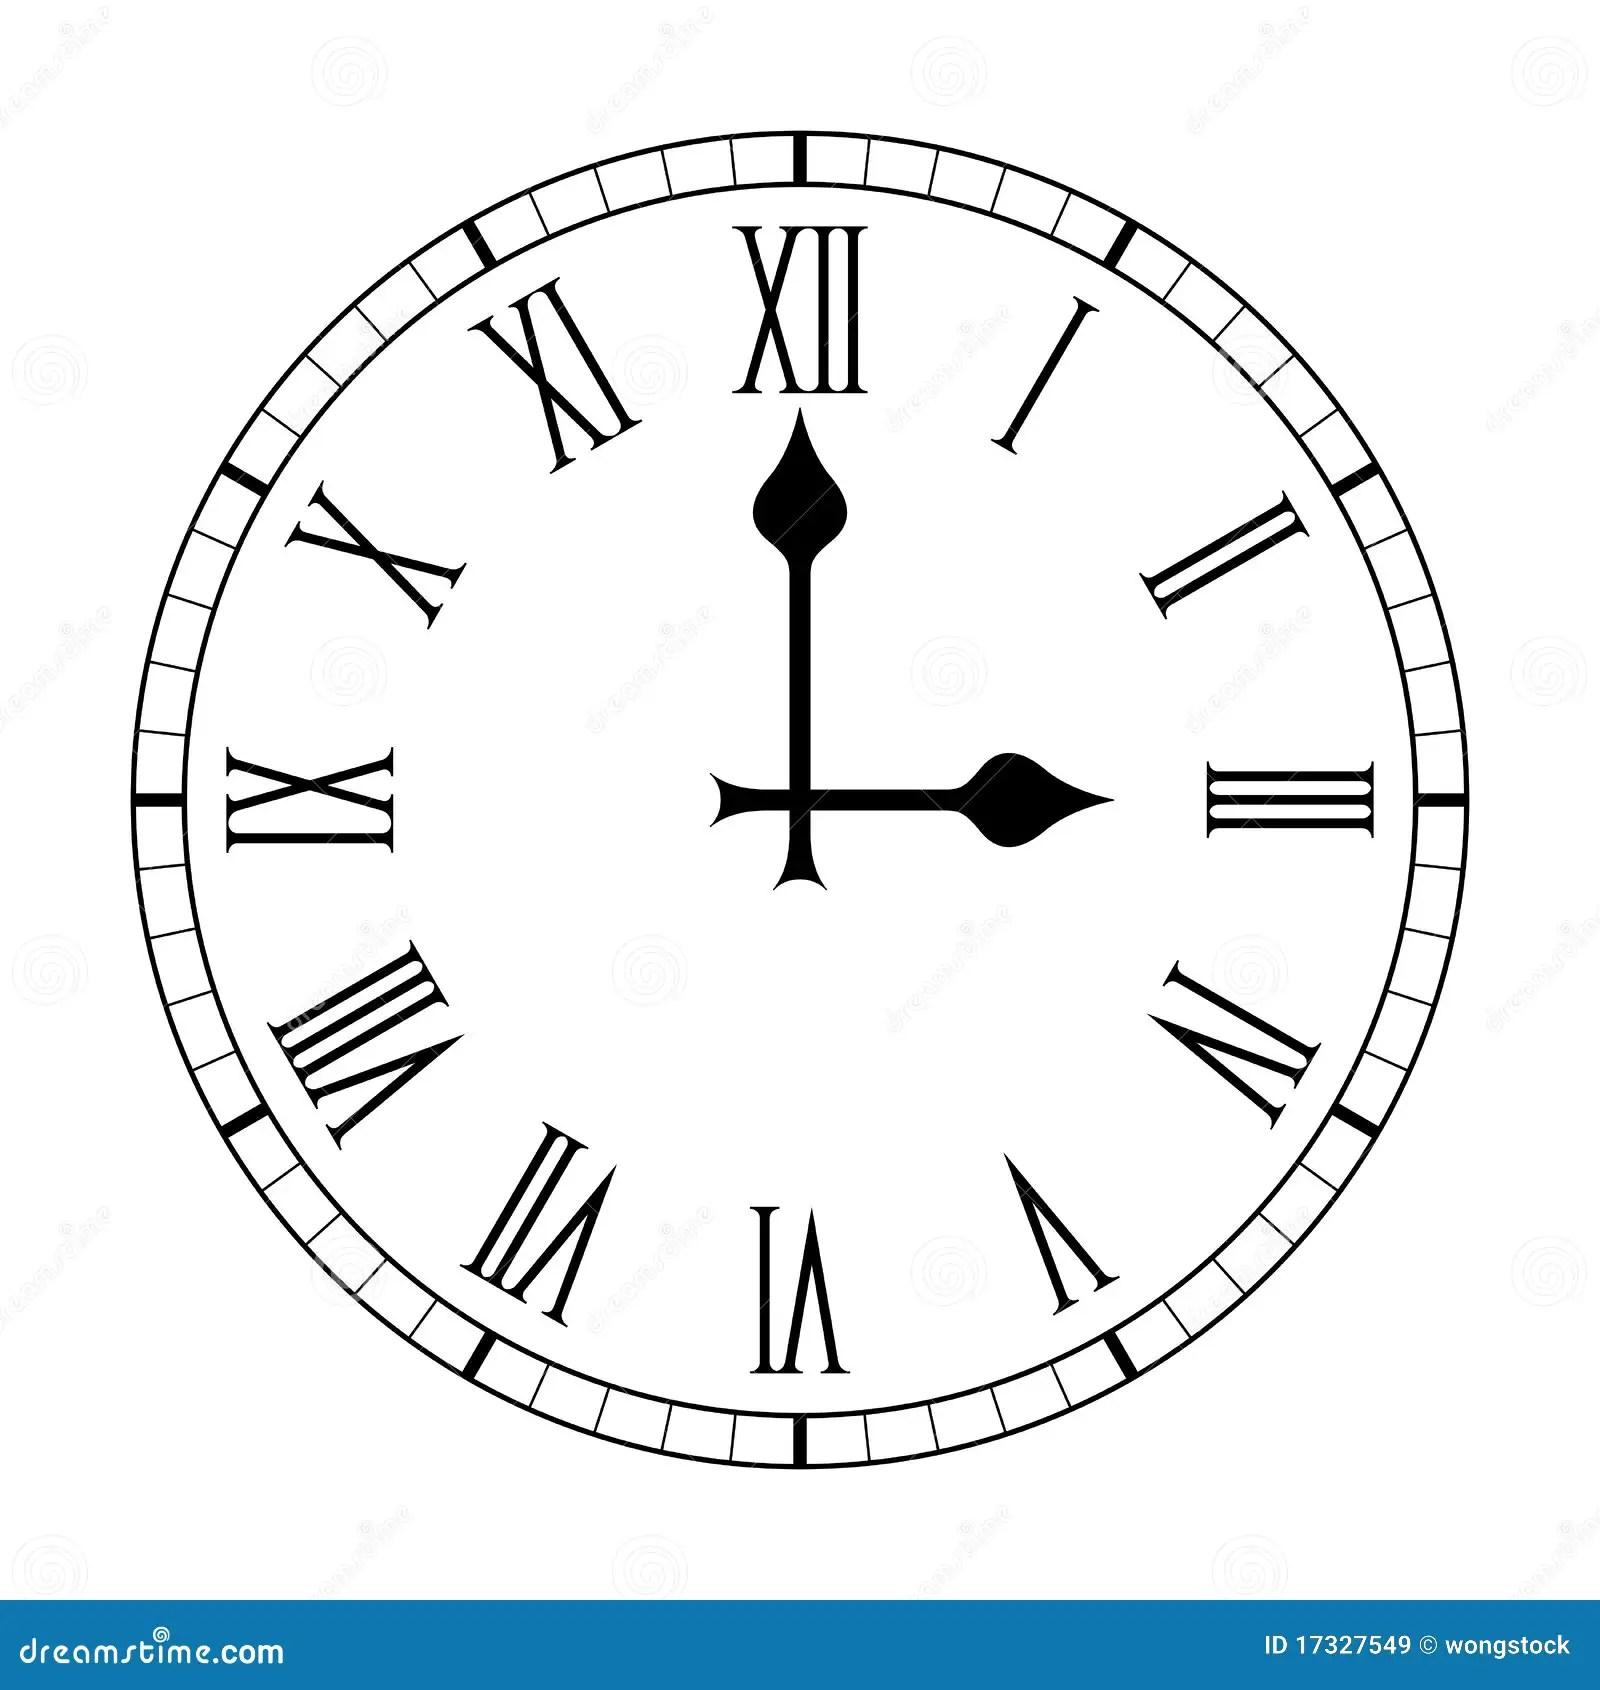 Plain Roman Numeral Clock Face On White Royalty Free Stock